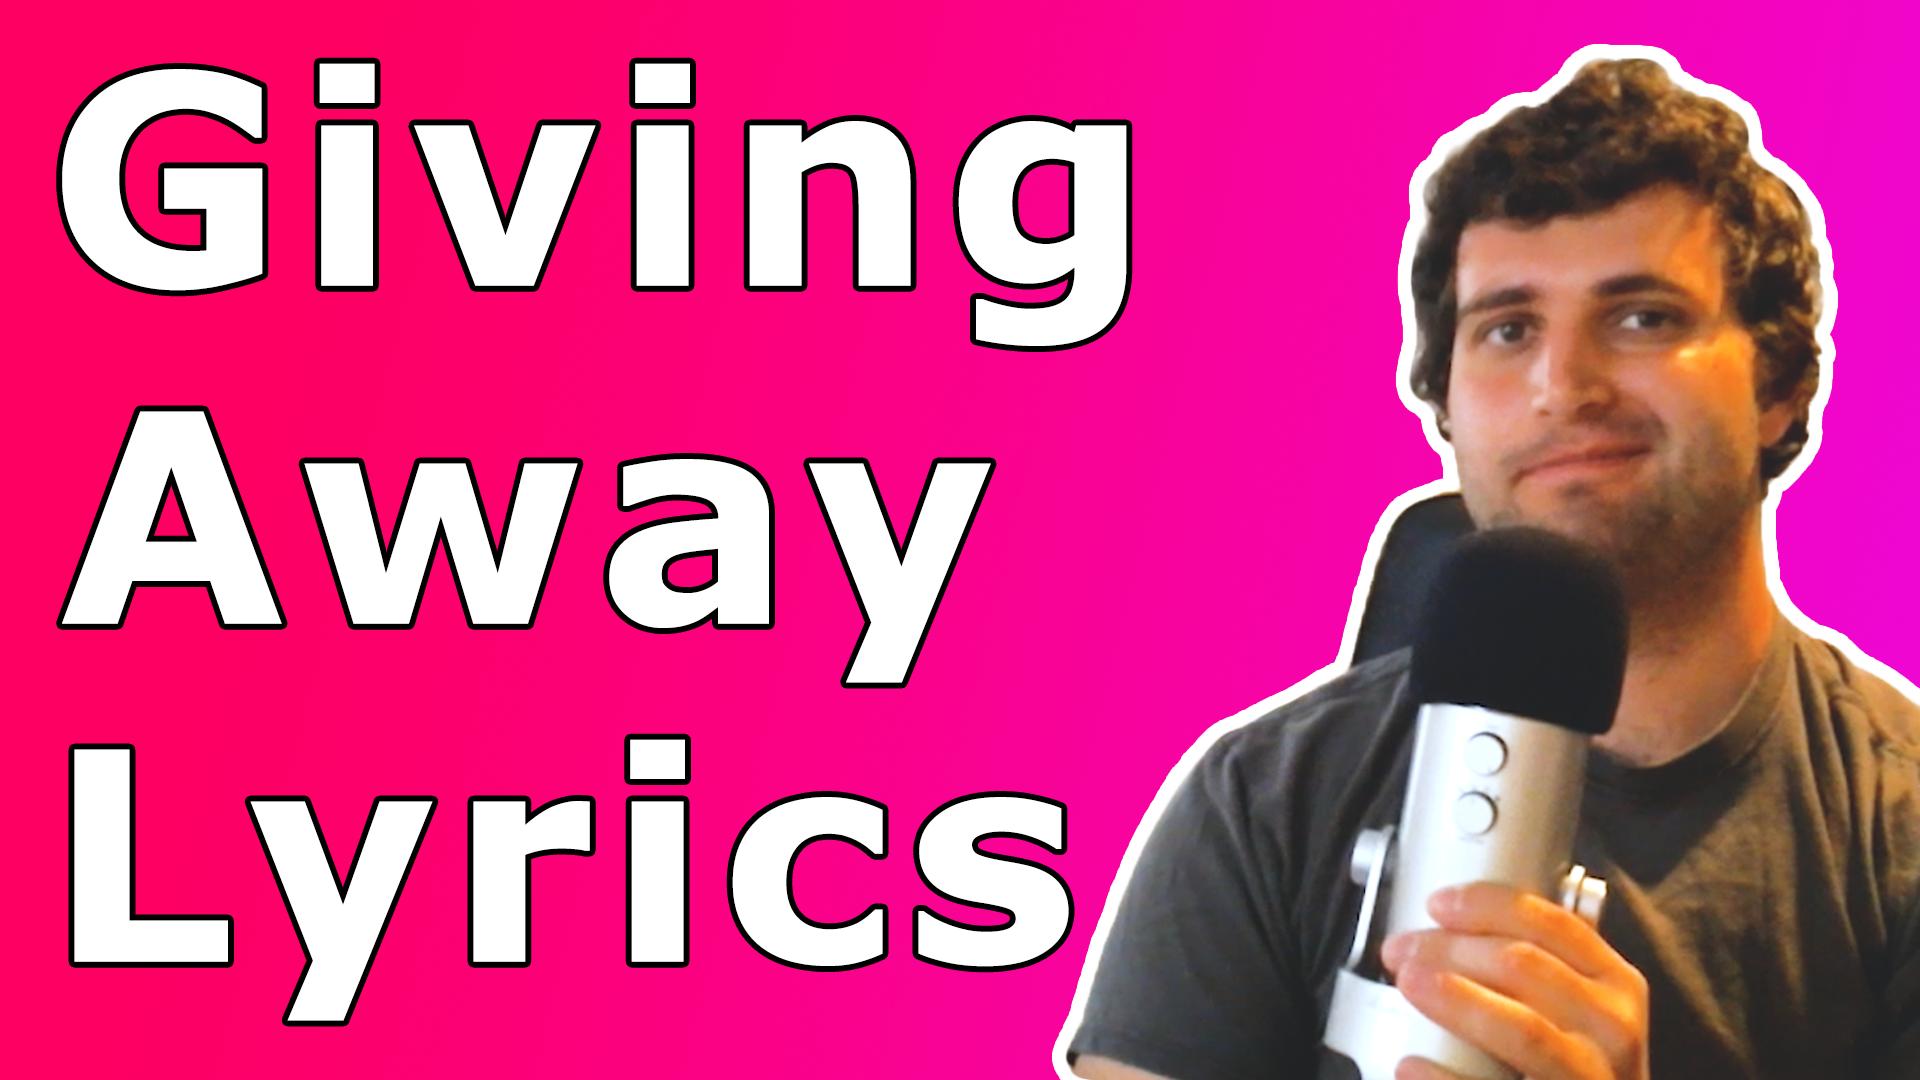 @givingawaylyrics